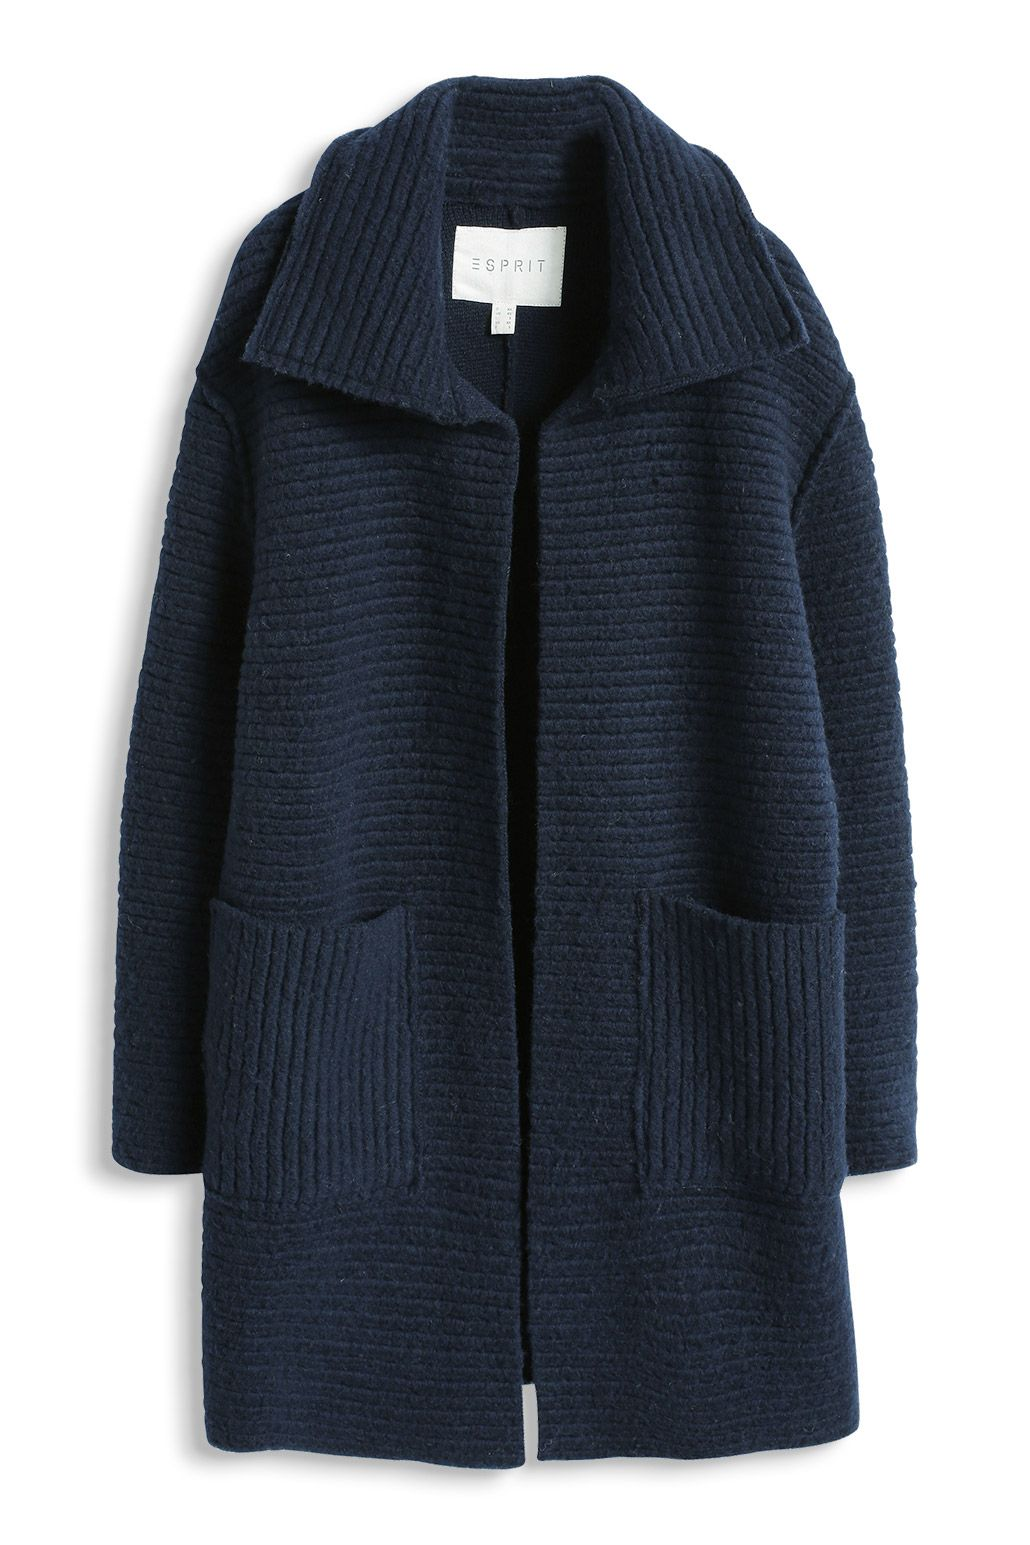 Rib Knit Fashion Coat Knit Fashion Coat Fashion Coat [ 1545 x 1030 Pixel ]